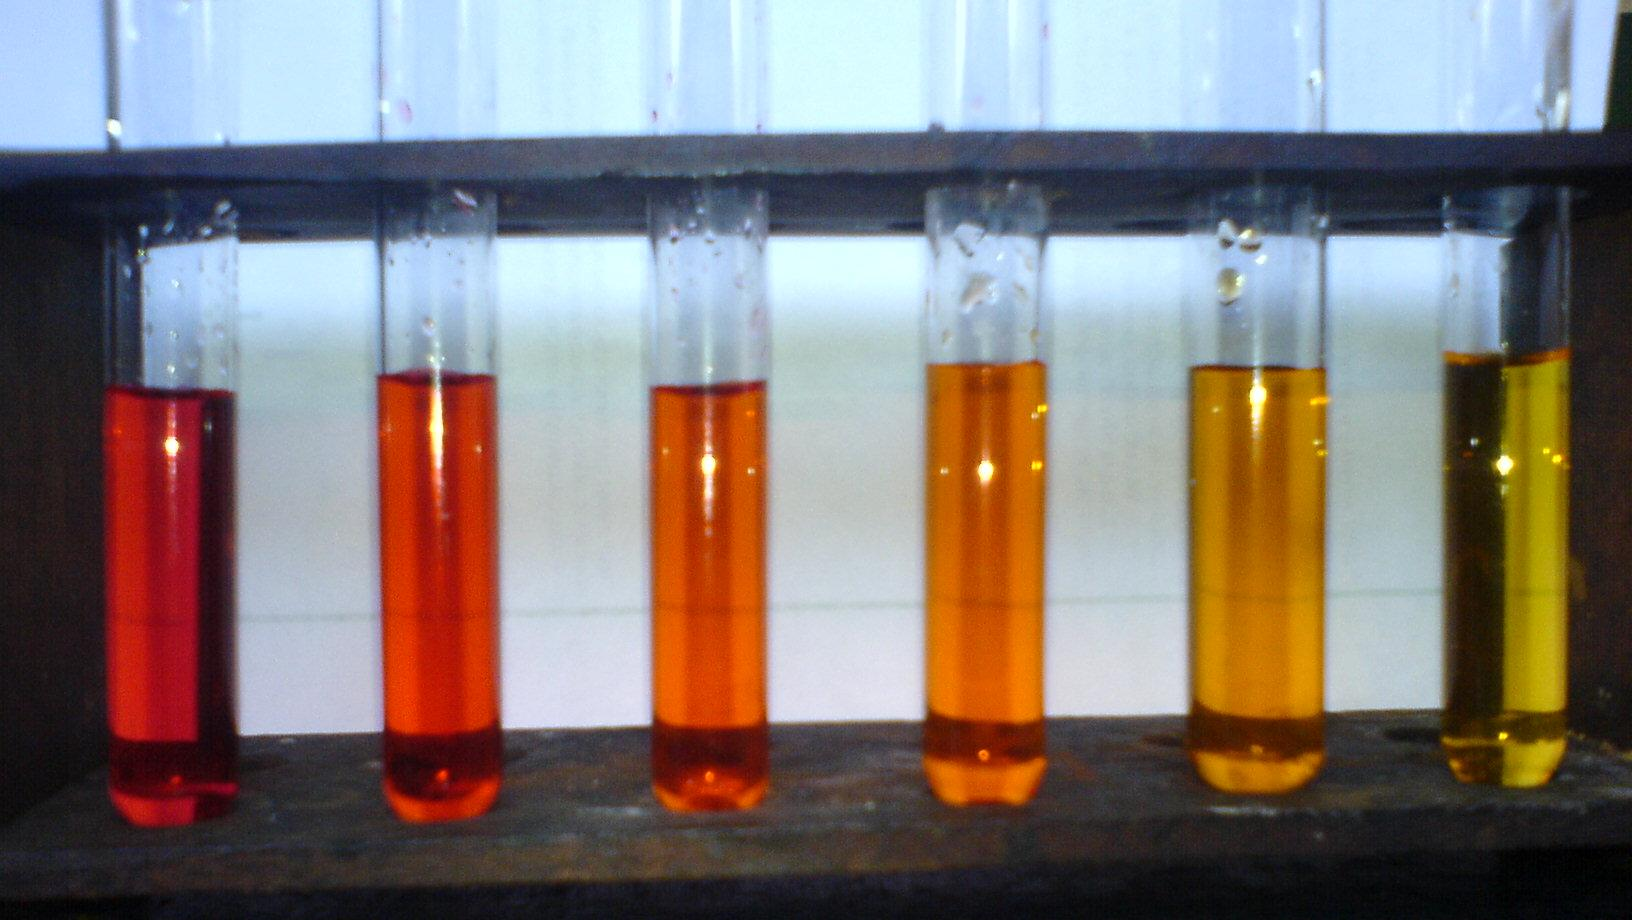 File:Methyl orange 02035.JPG - Wikimedia Commons for Methyl Orange Indicator  51ane